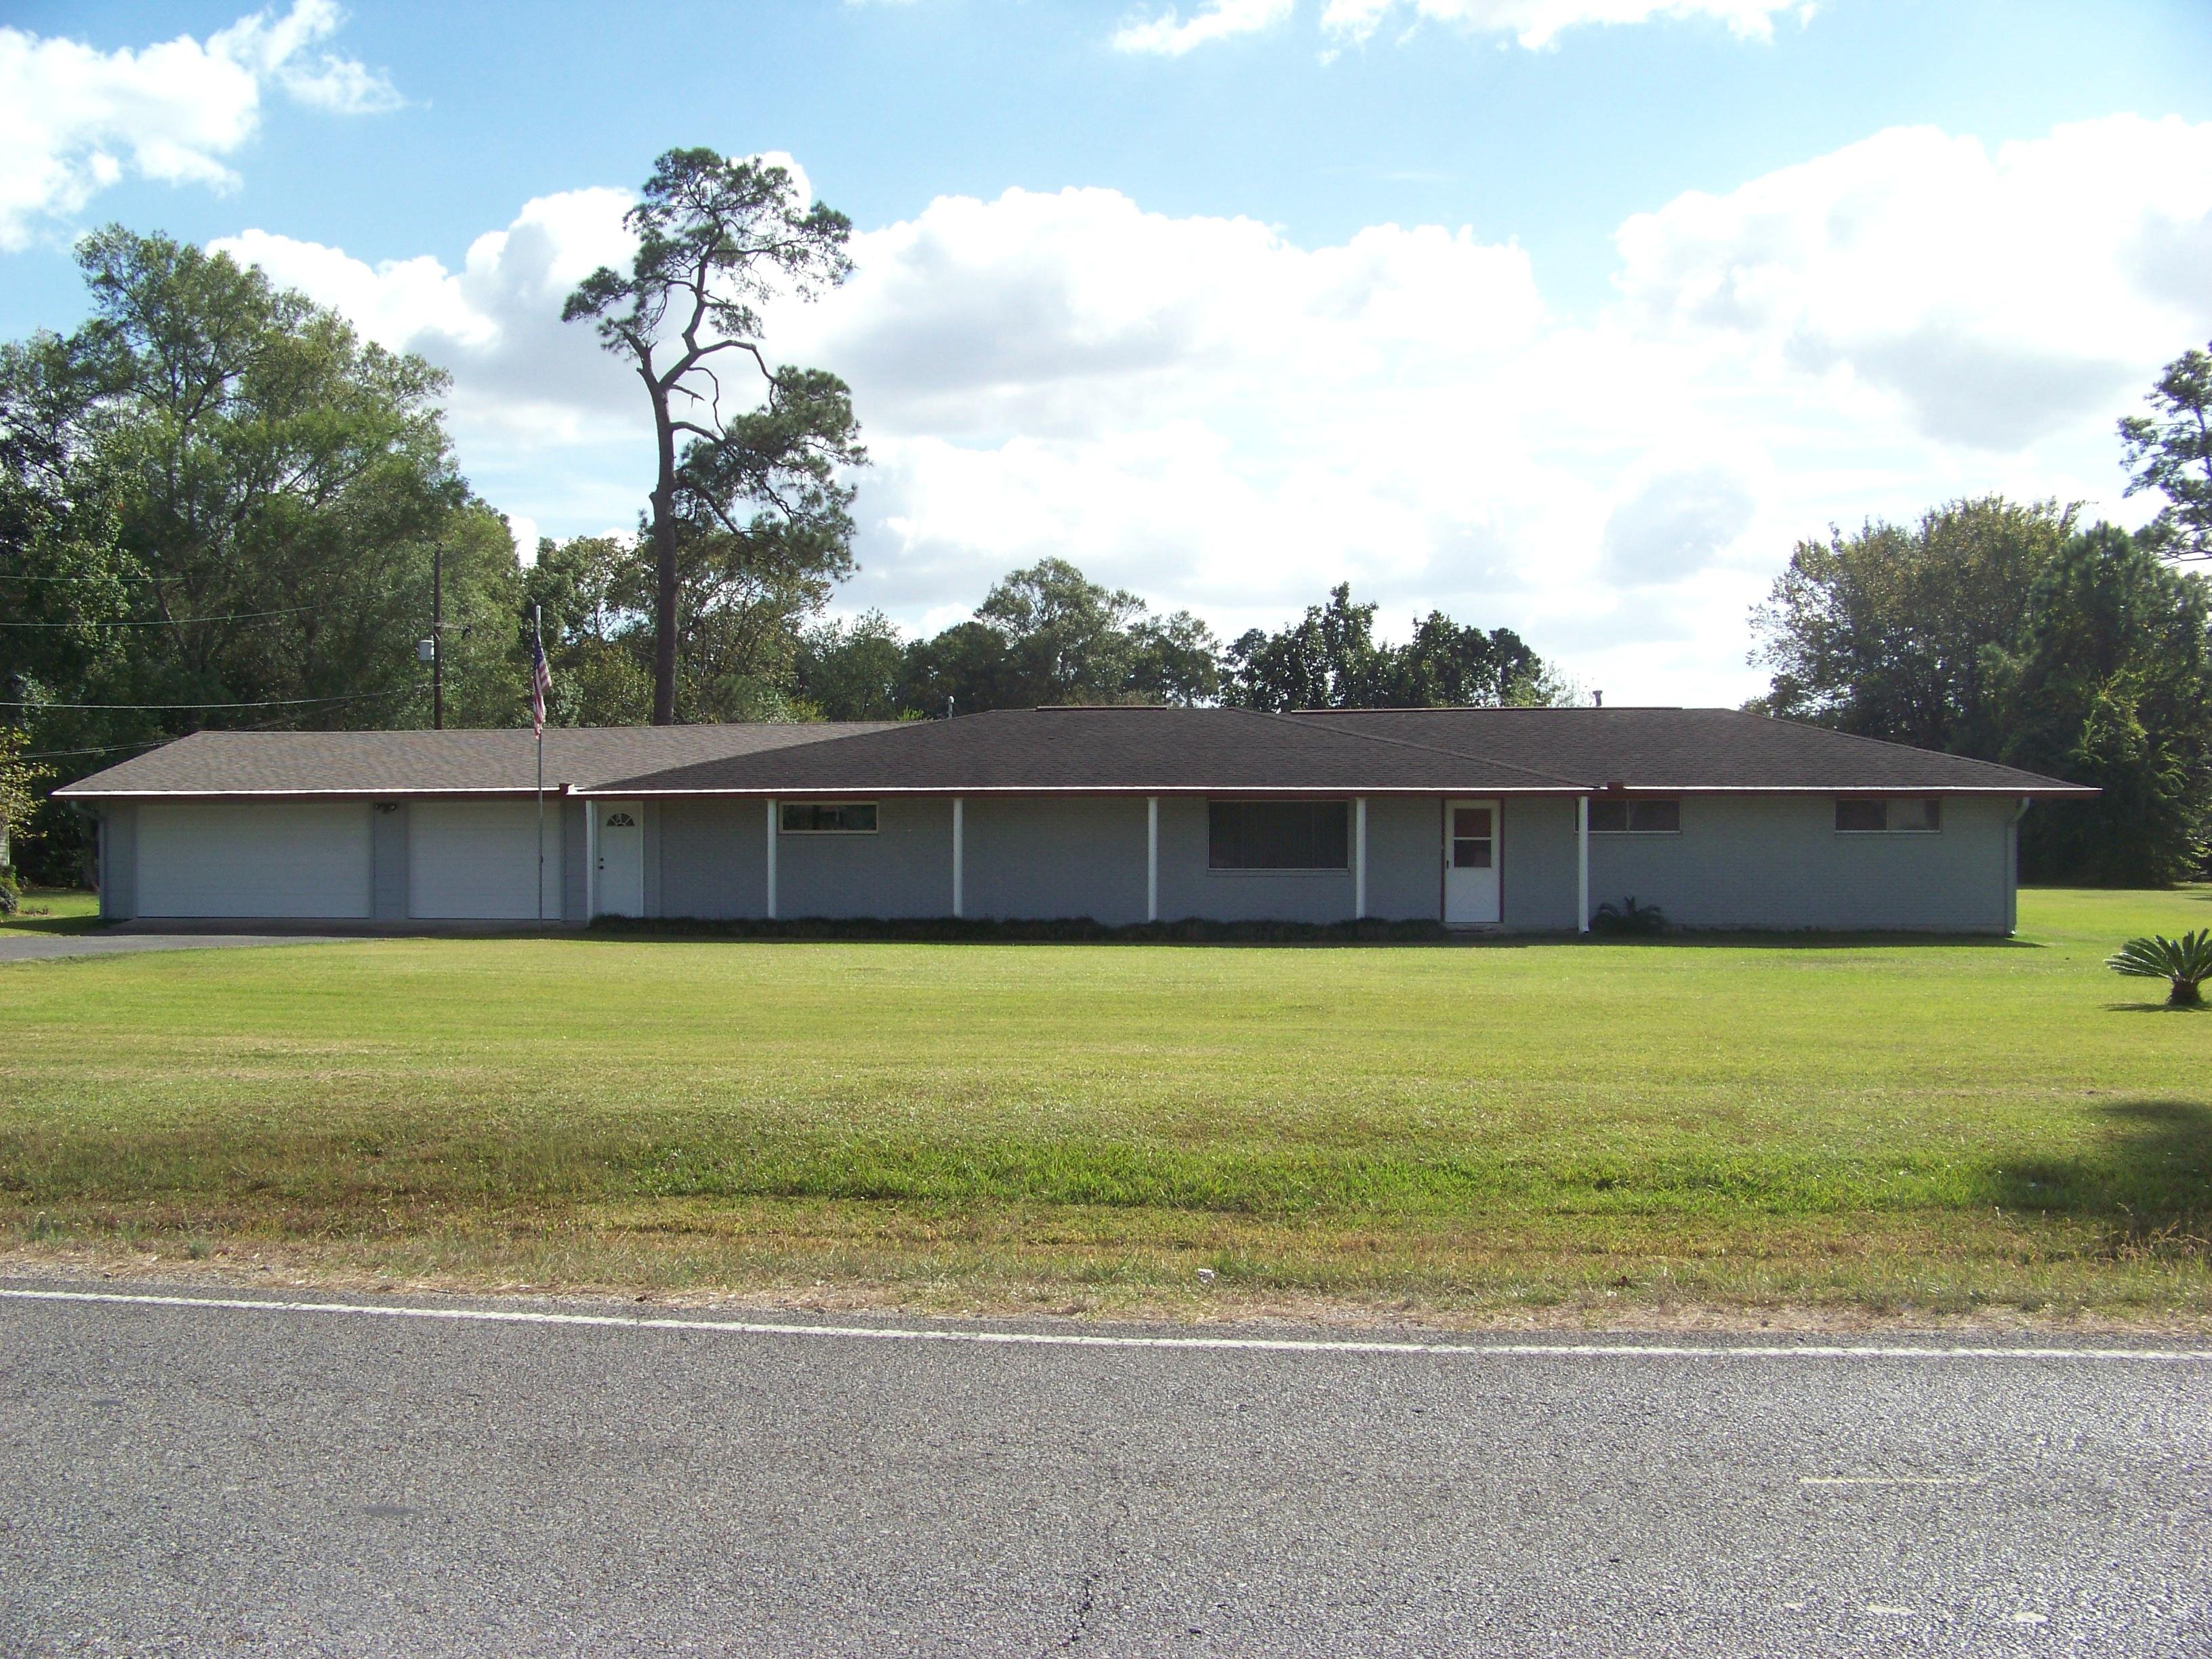 801 Johnstine Rd., Westlake, Louisiana 70669